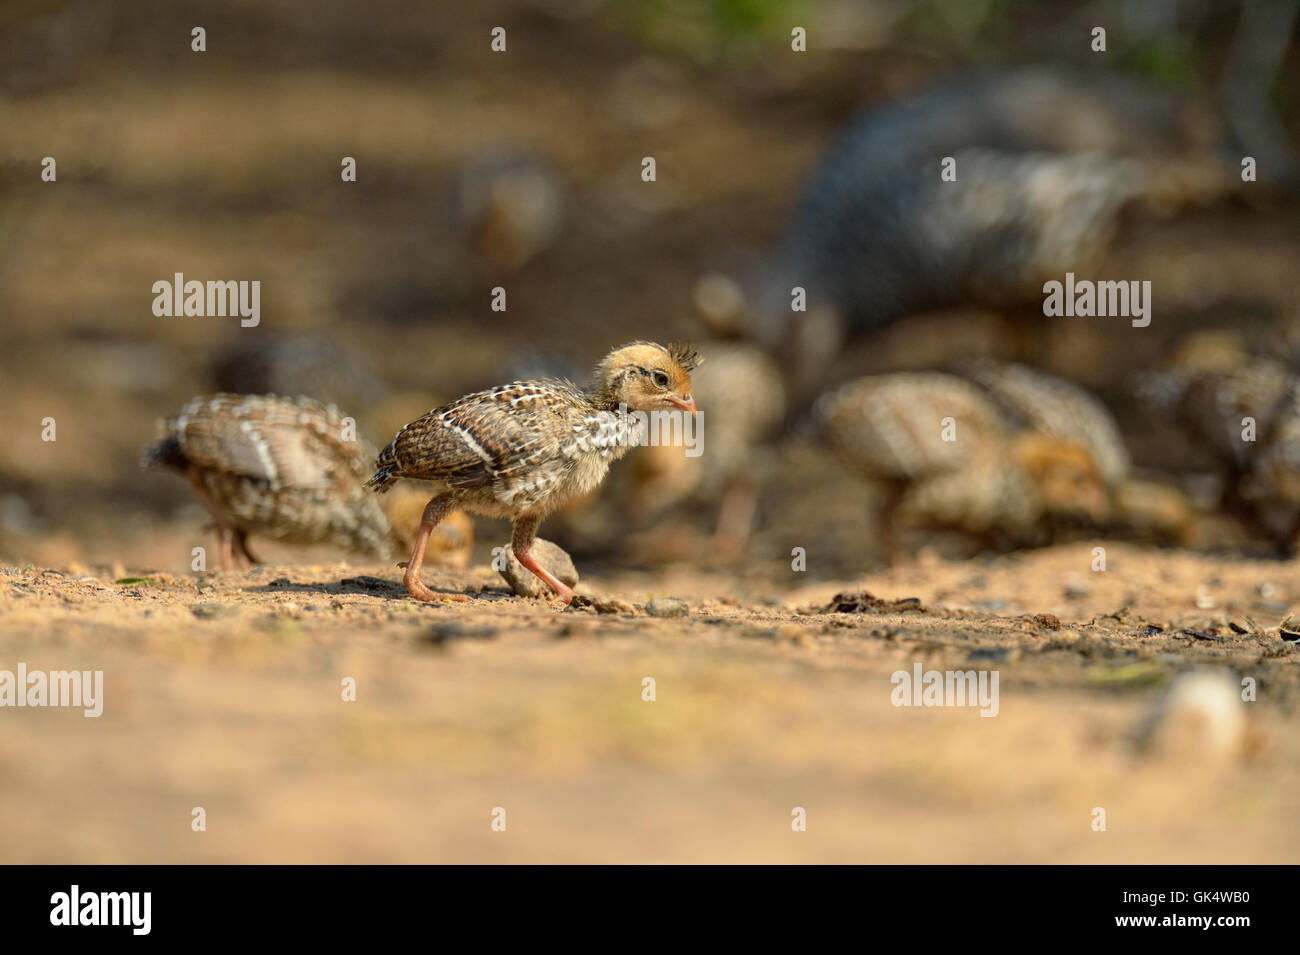 Scaled Quail (Callipepla Squamata) Chicks Attracted To Seeds Below Bird  Feeder, Rio Grande City, Texas, USA